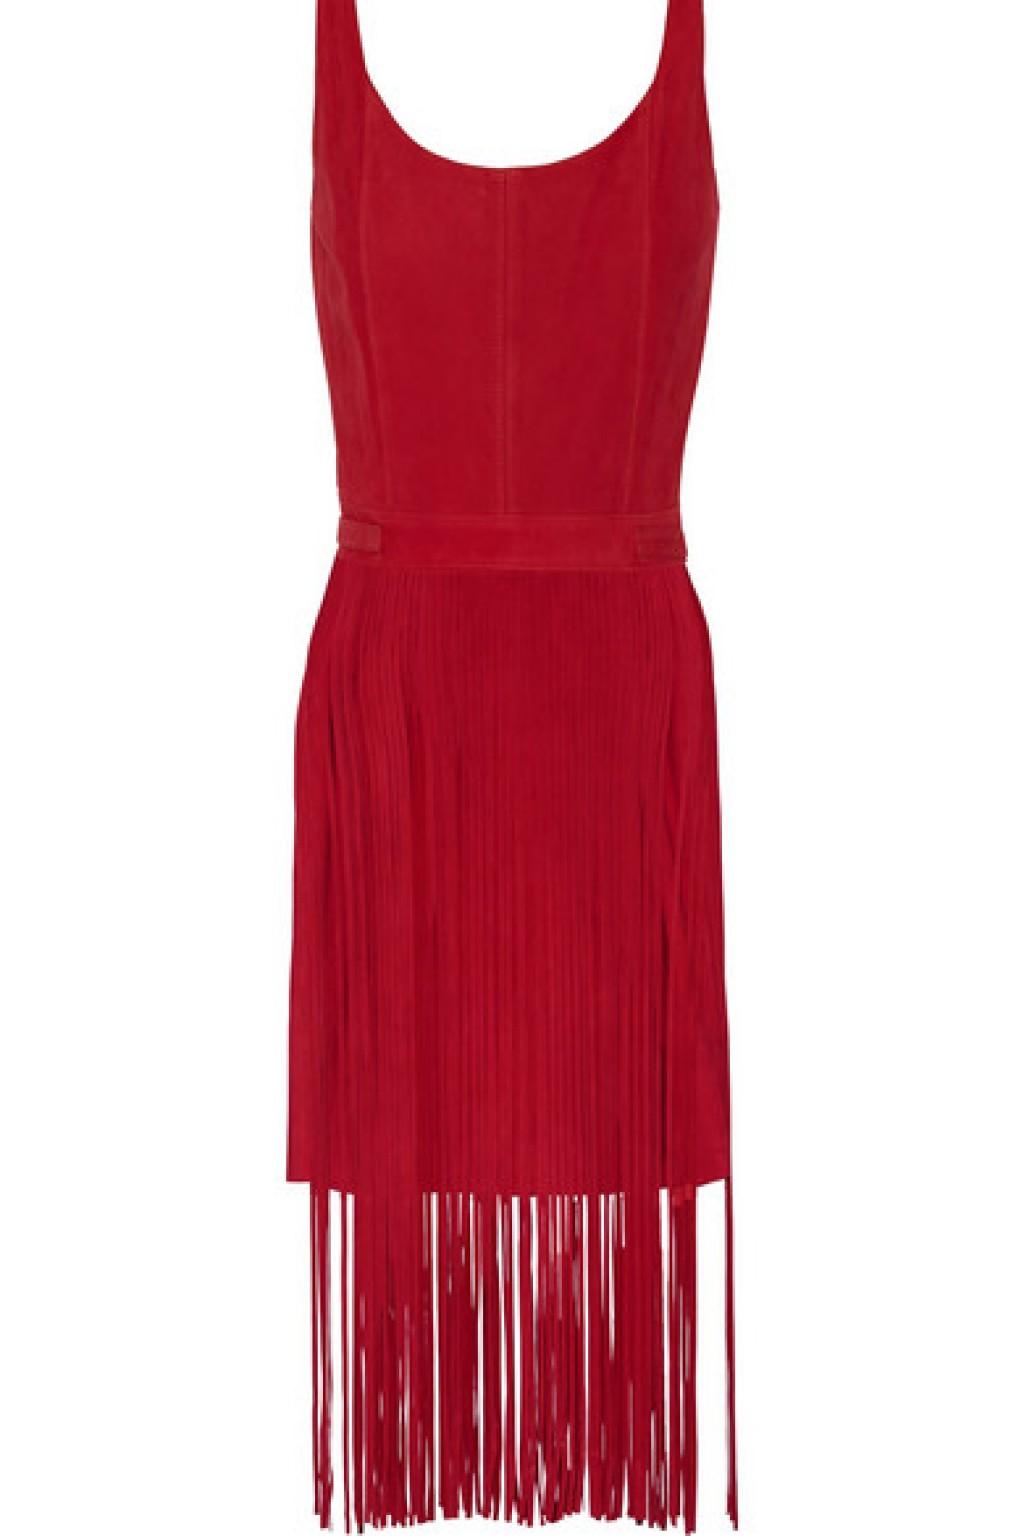 tamara-mellon-red-suede-sleeveless-suede-fringe-dress-main-1024x1536